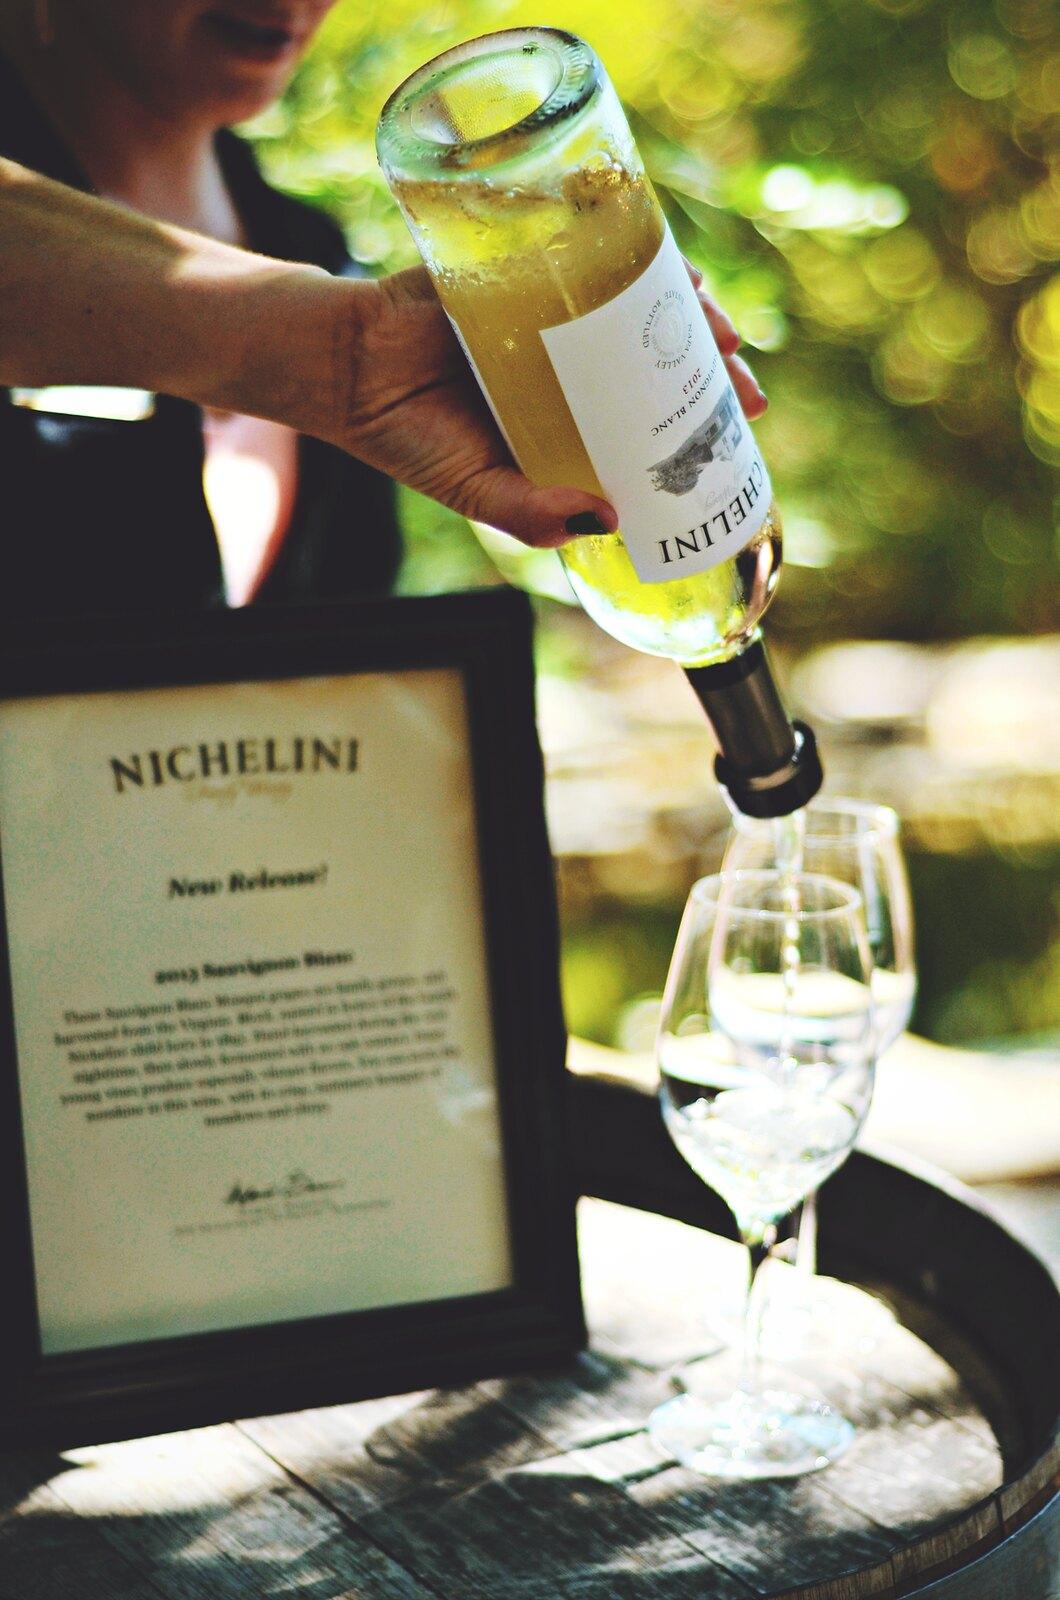 Wine tasting at Nichelini Vineyard in Napa Valley, USA | via It's Travel O'Clock